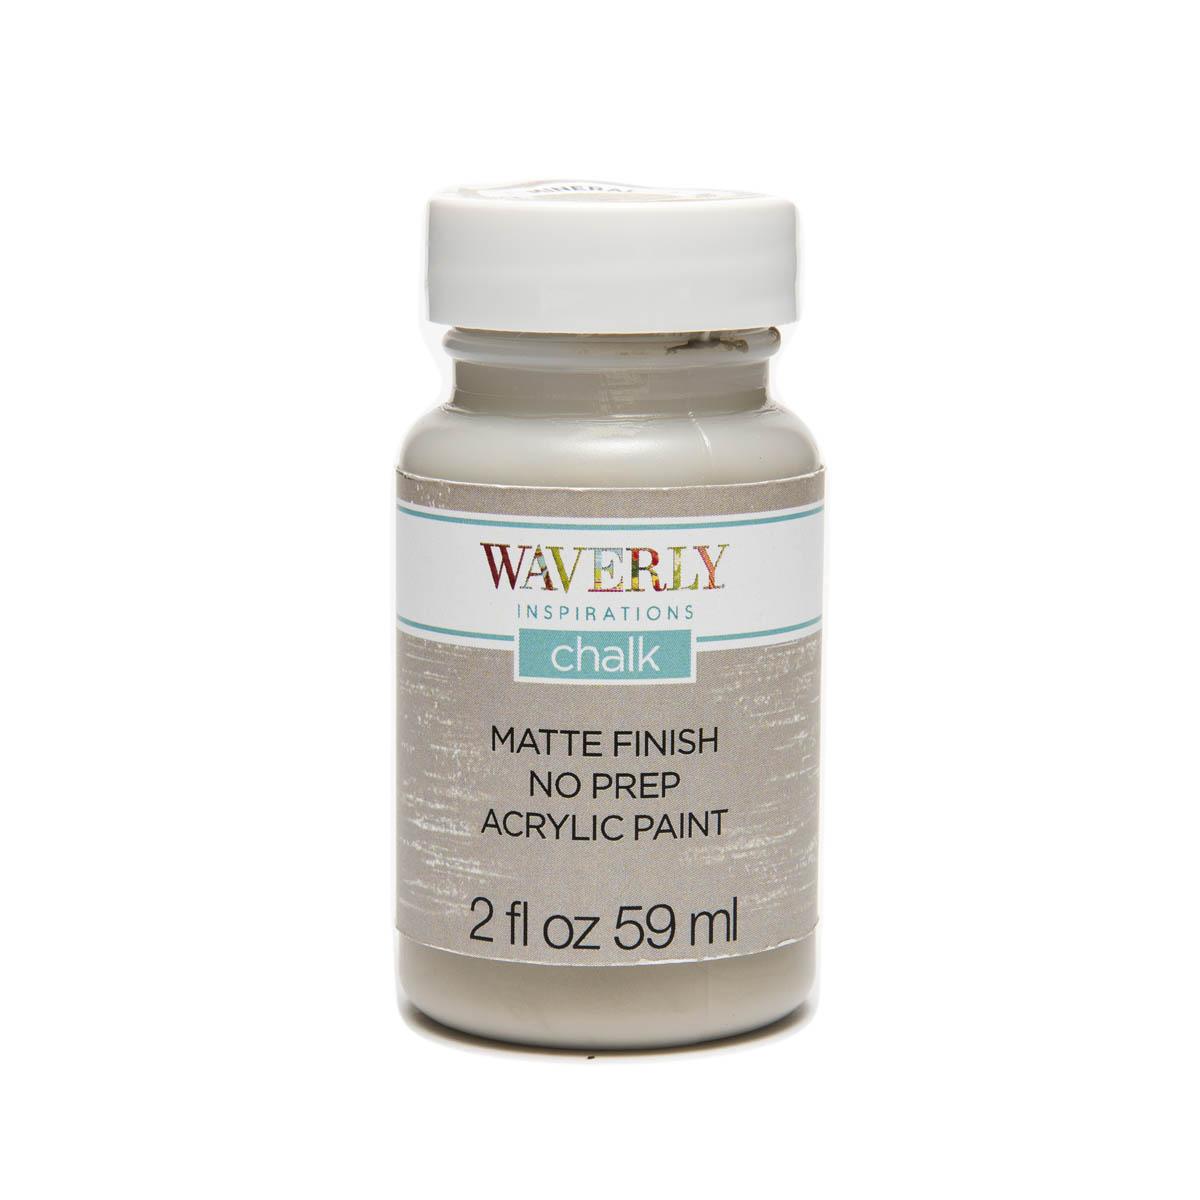 Waverly ® Inspirations Chalk Finish Acrylic Paint - Mineral, 2 oz. - 60896E